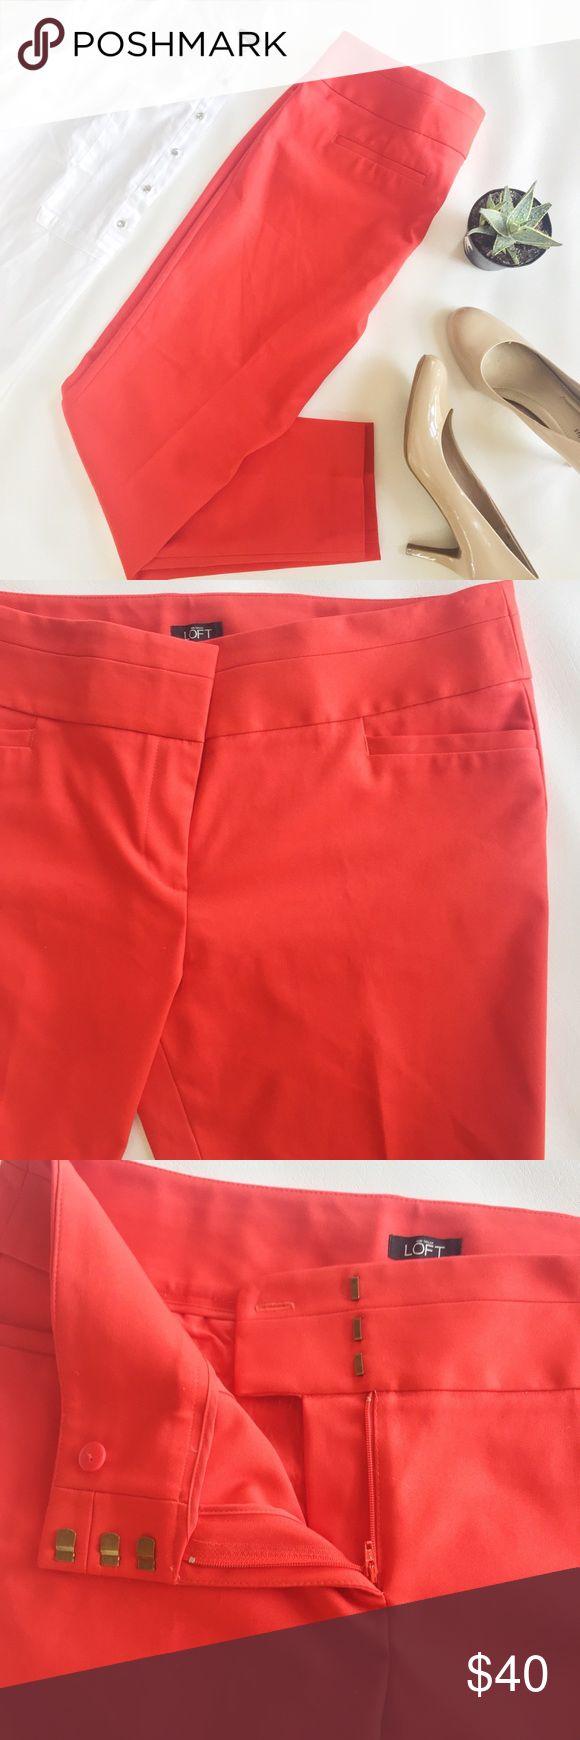 LOFT Red Marisa Skinny Pants NWT LOFT | 14 | Marisa Skinny | Red | 3 latch, zip & button closure | NWT - never worn LOFT Pants Skinny